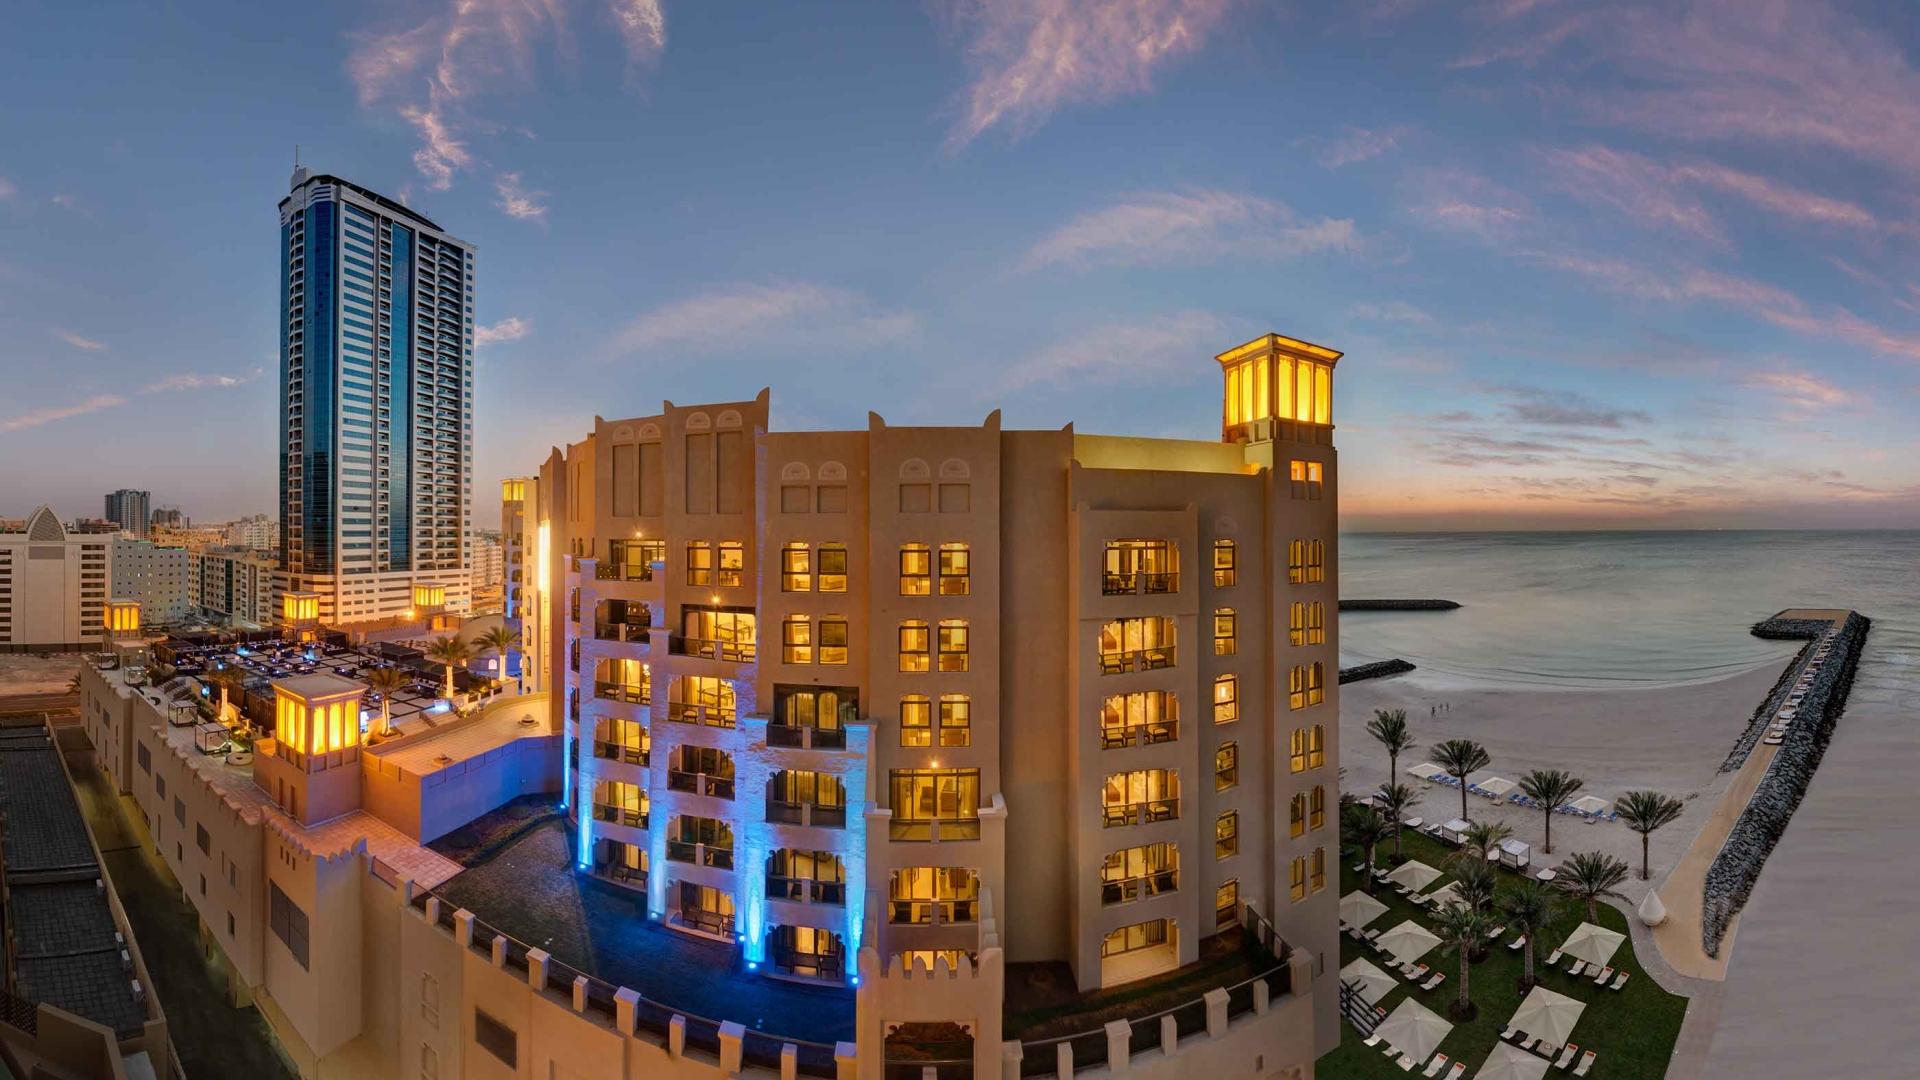 Bahi Ajman Palace Hotel Building View